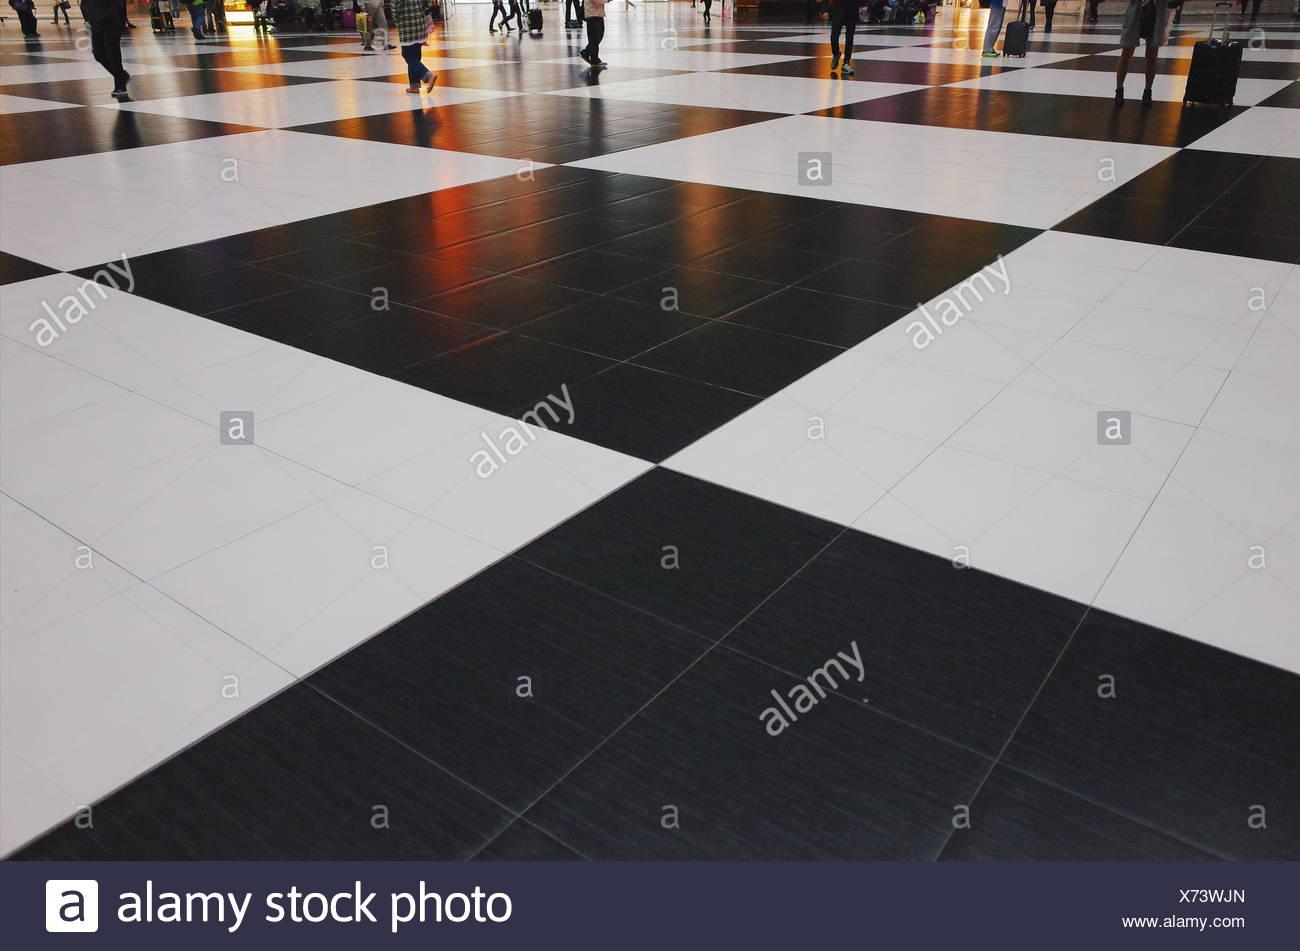 Checkered Tile Floor - Stock Image